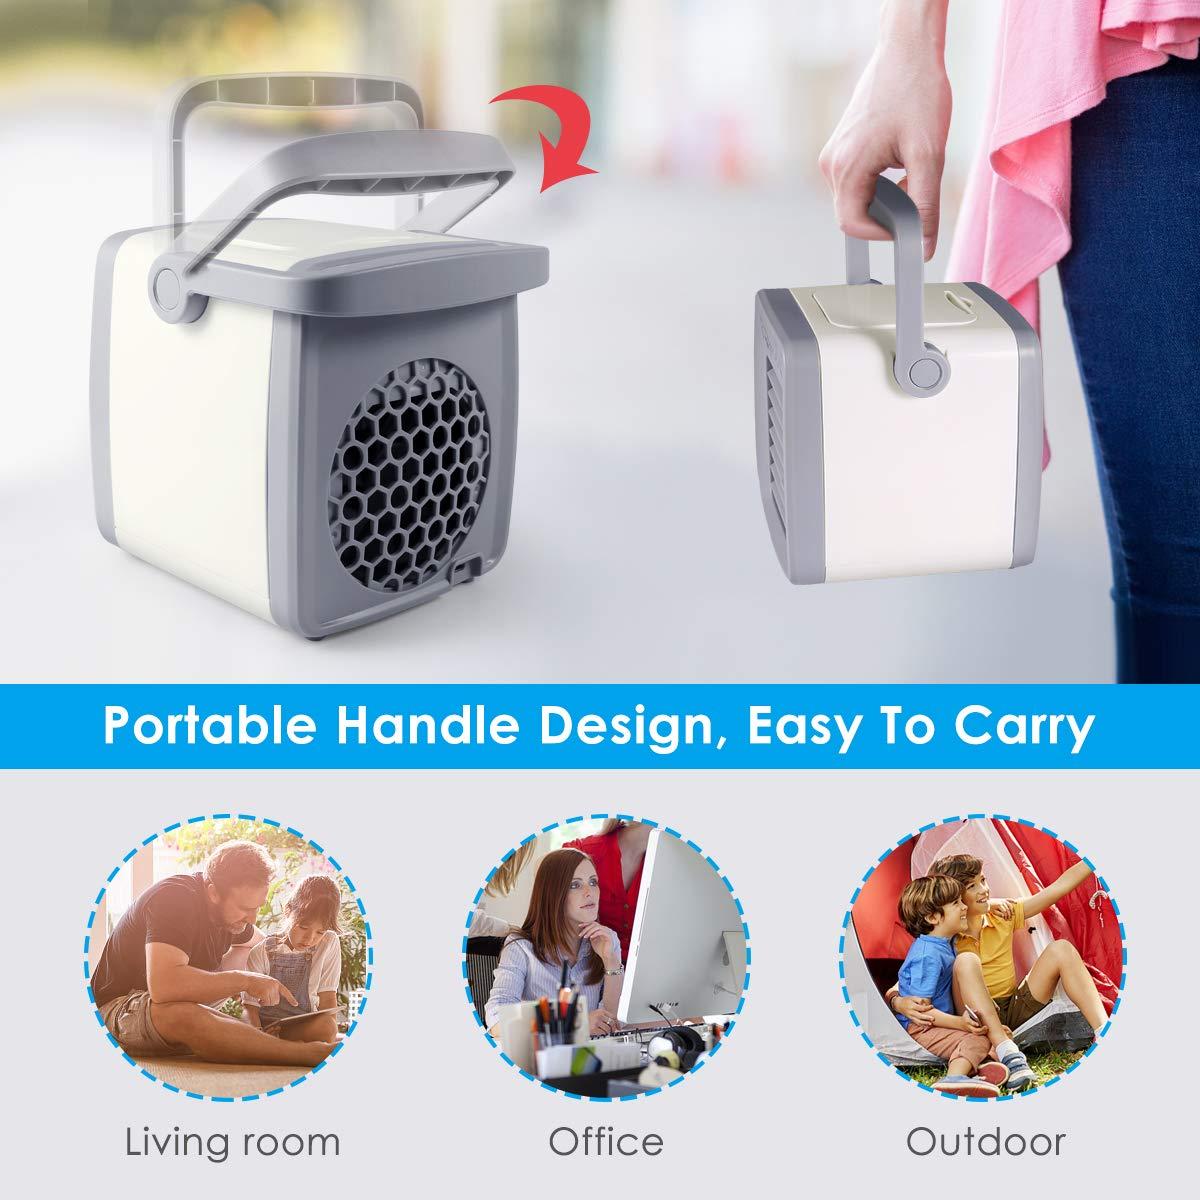 Outdoor Room Air Personal Air Conditoner Small Desktop Fan Quiet Personal Table Fan Mini Evaporative Air Circulator Cooler Humidifier for Office Auka Personal Air Cooler Dorm